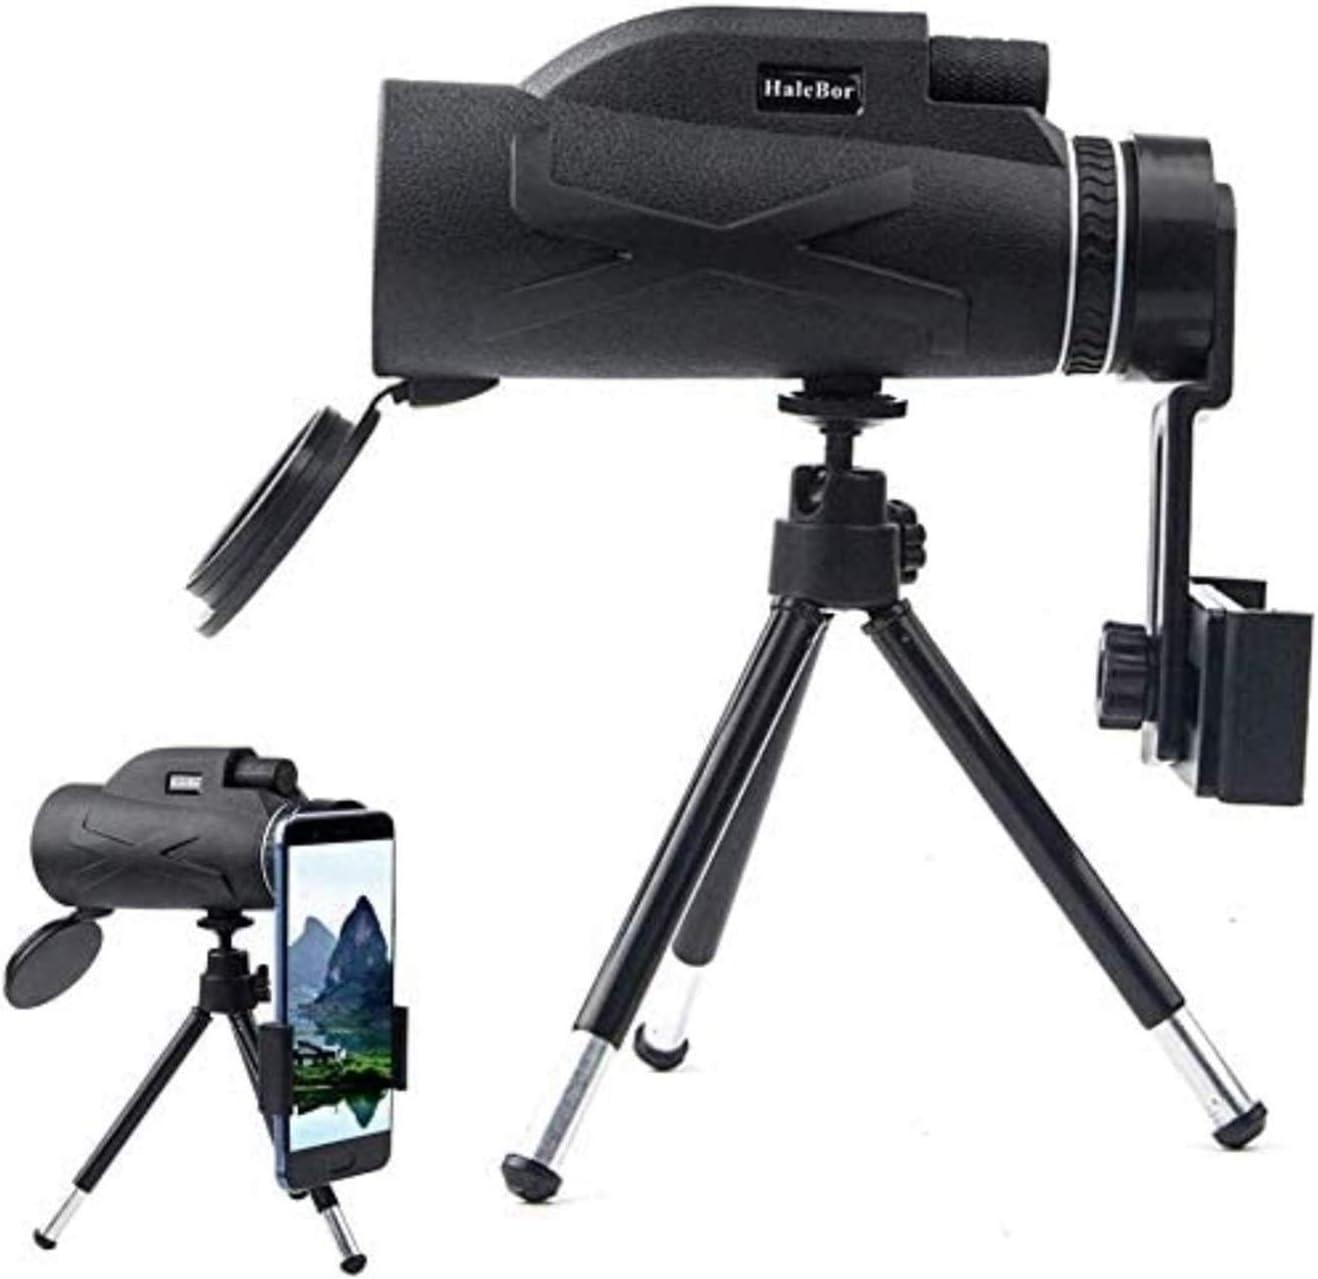 LJYY Telescopio monocular de Alta Potencia 80x100, monoculares portátiles compactos, Alcance a Prueba de Agua con Clip para teléfono y trípode para teléfono Inteligente, observación de Aves, Caza